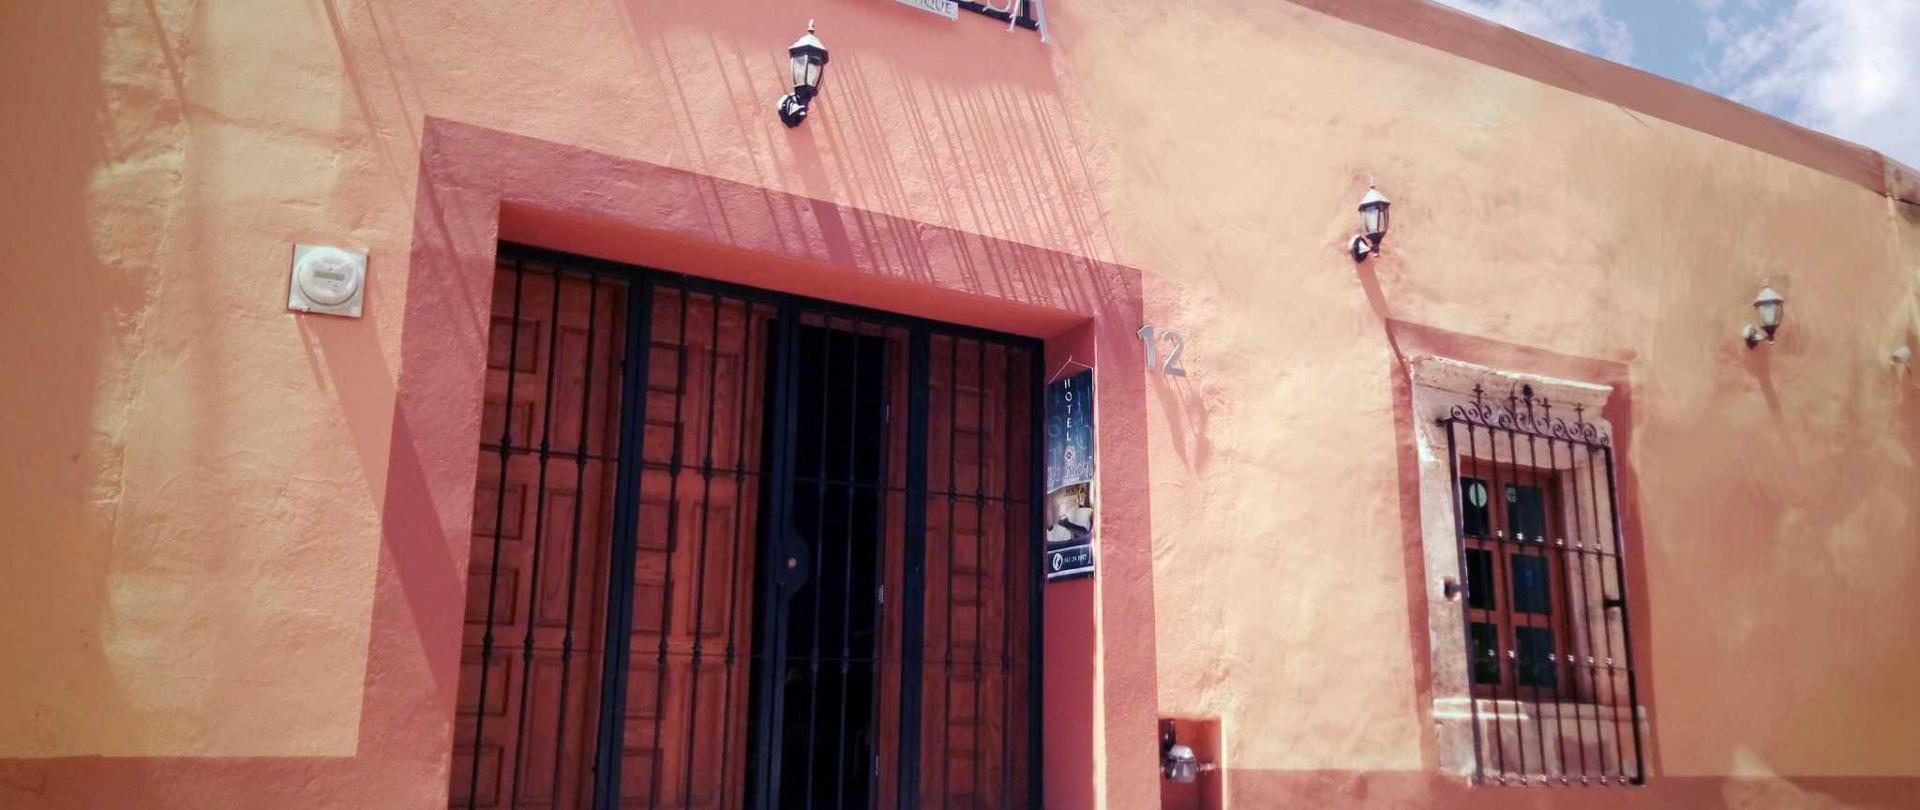 fachada-2-1.jpg